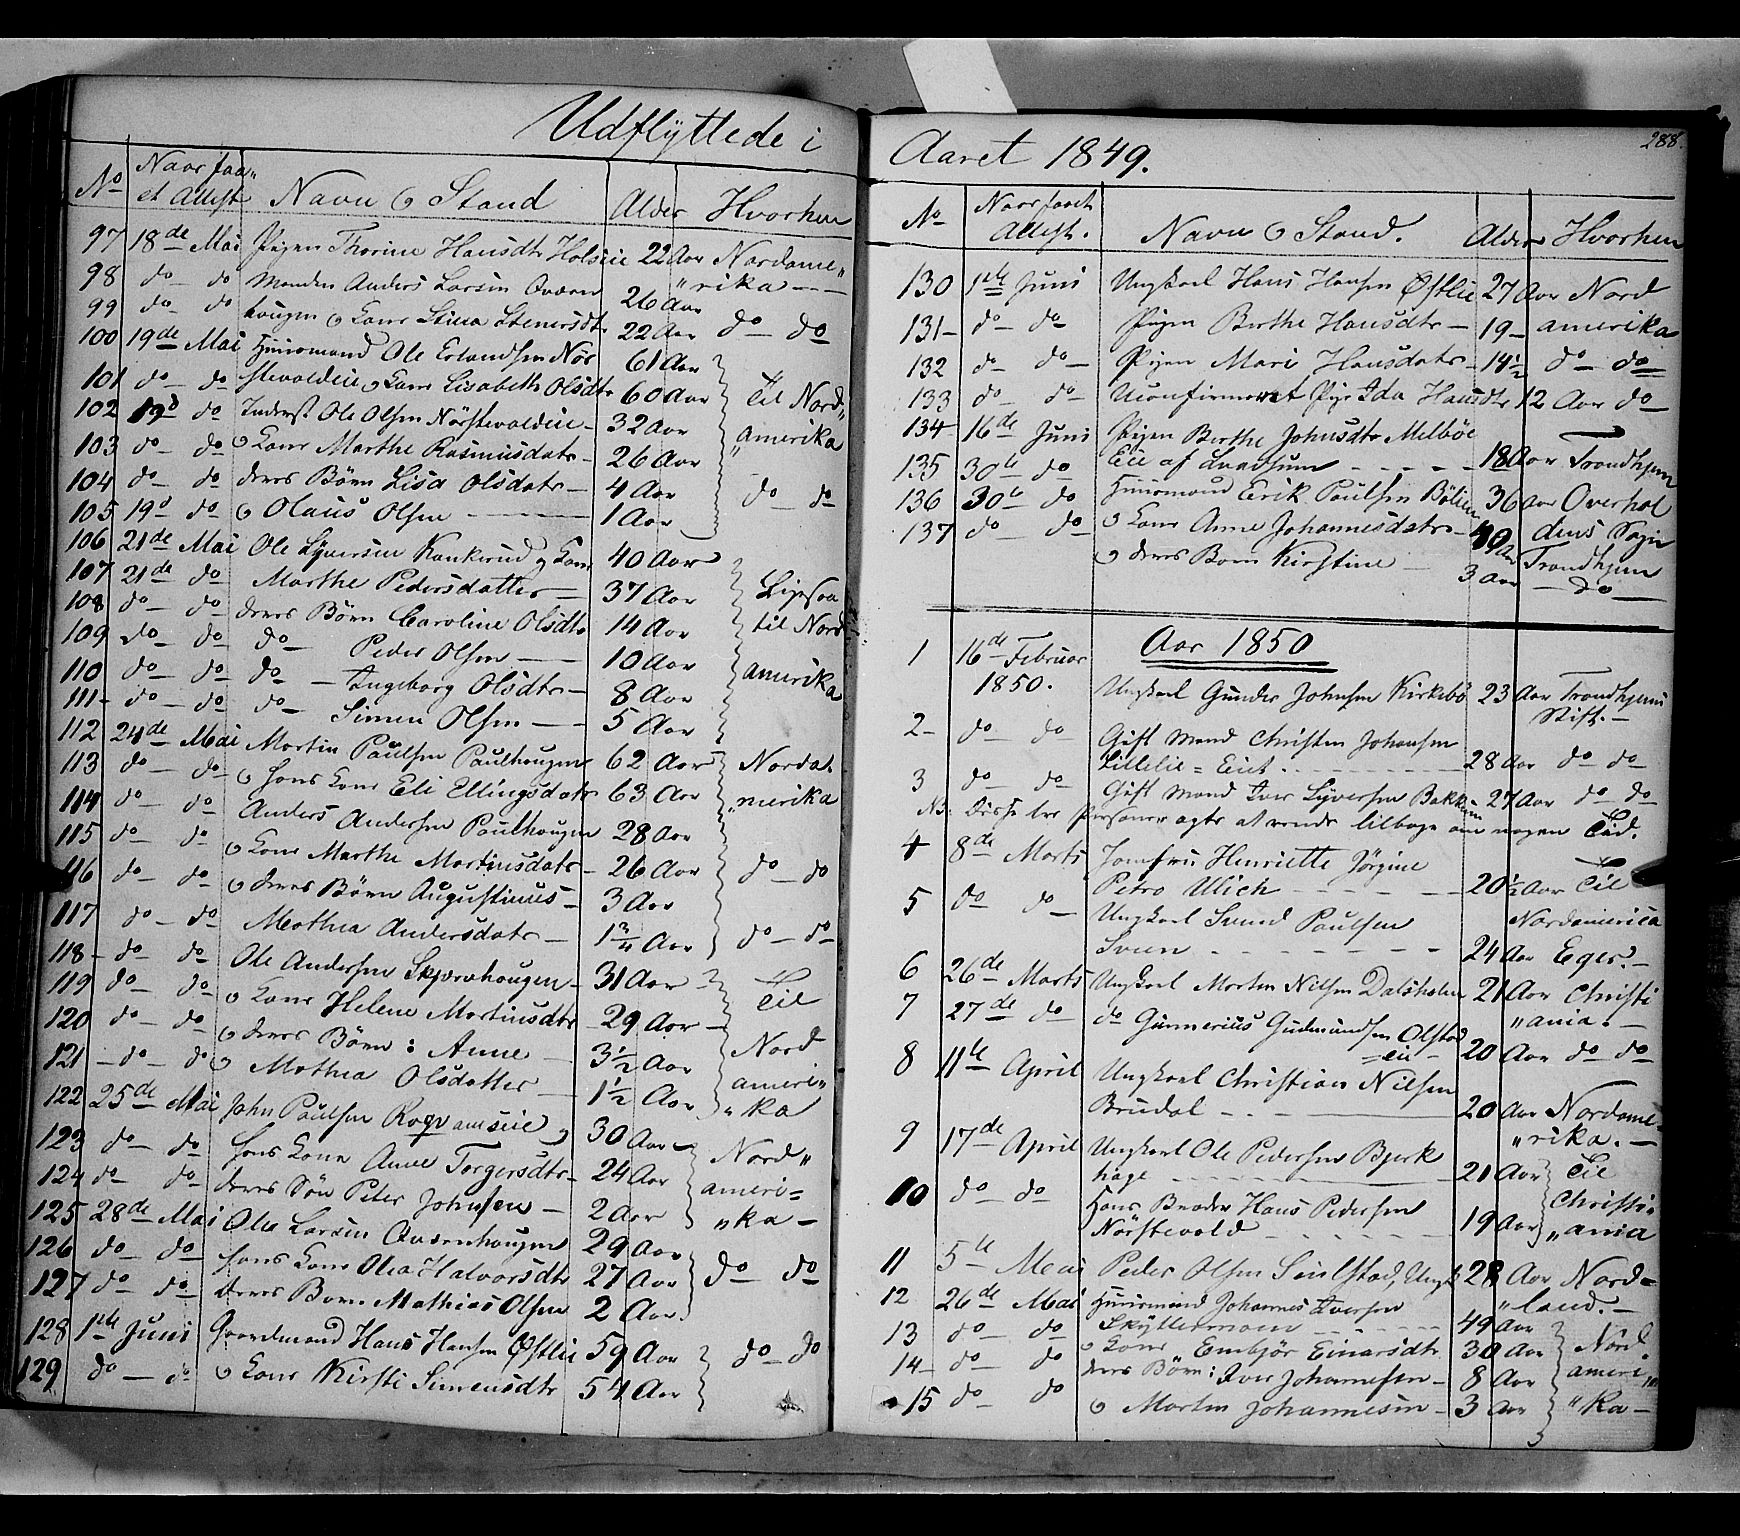 SAH, Gausdal prestekontor, Ministerialbok nr. 7, 1840-1850, s. 288